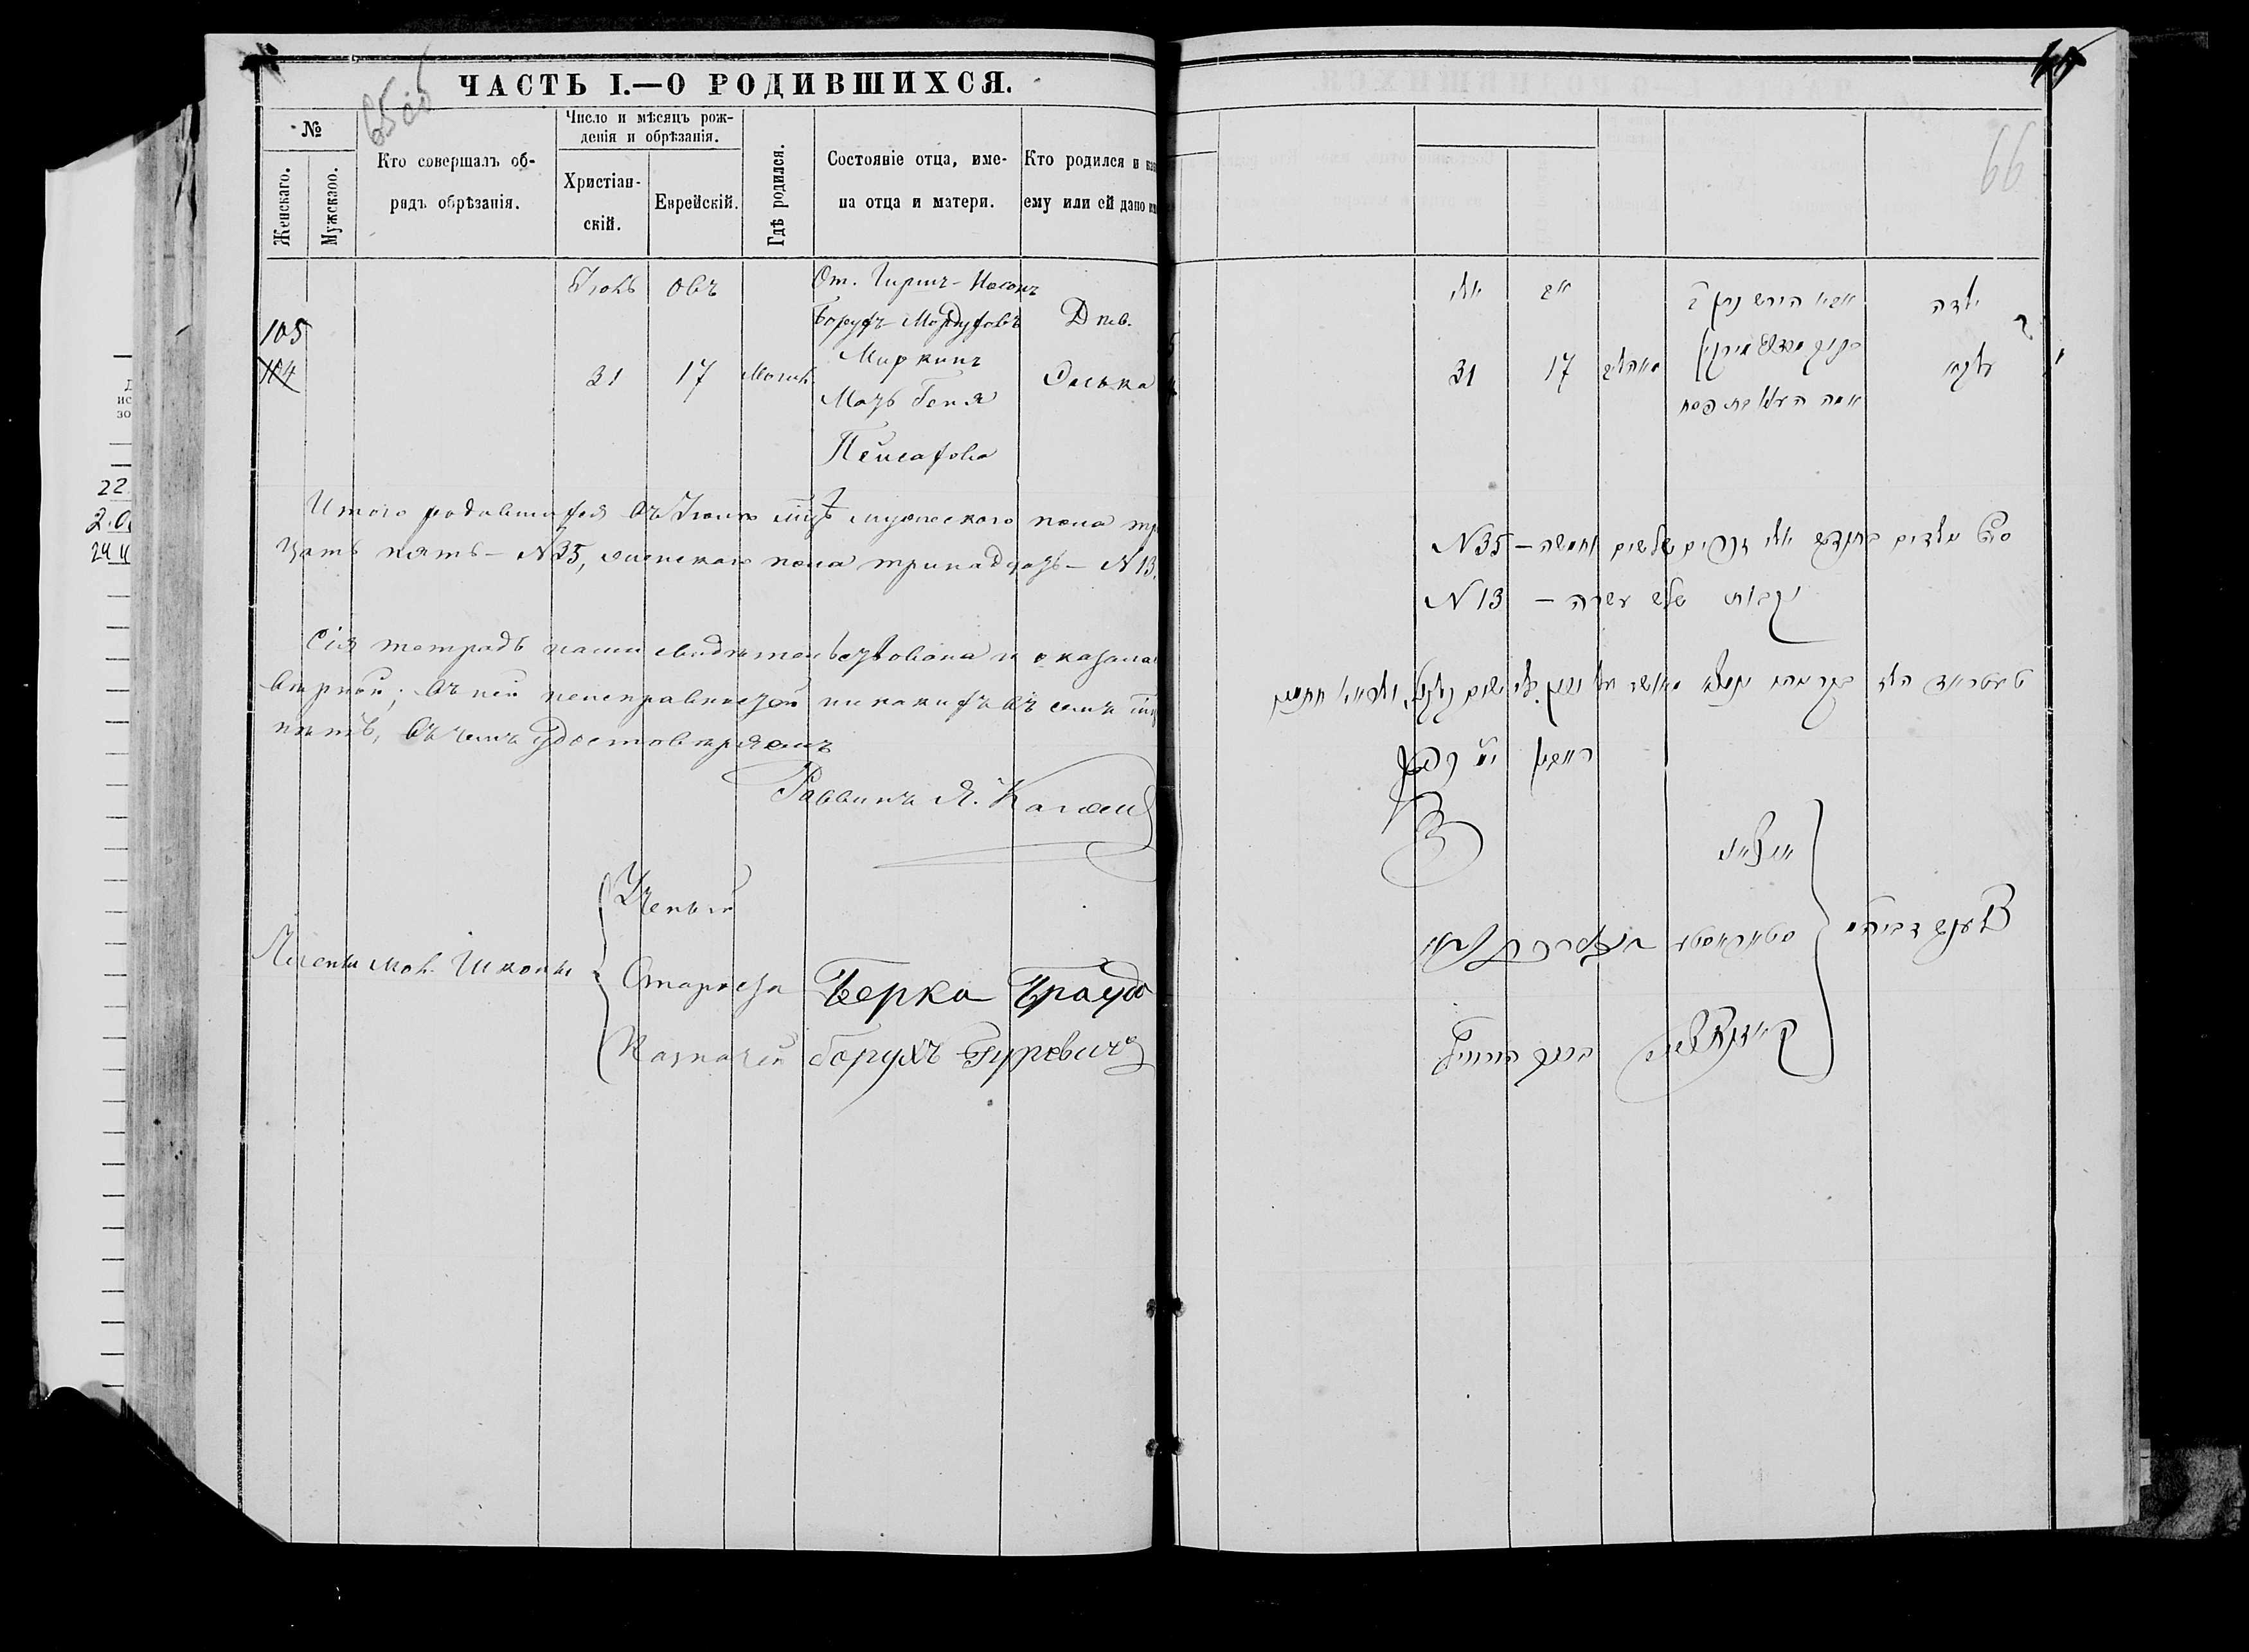 Элька Гиршевна Миркина 31 июня 1881, снимок 570